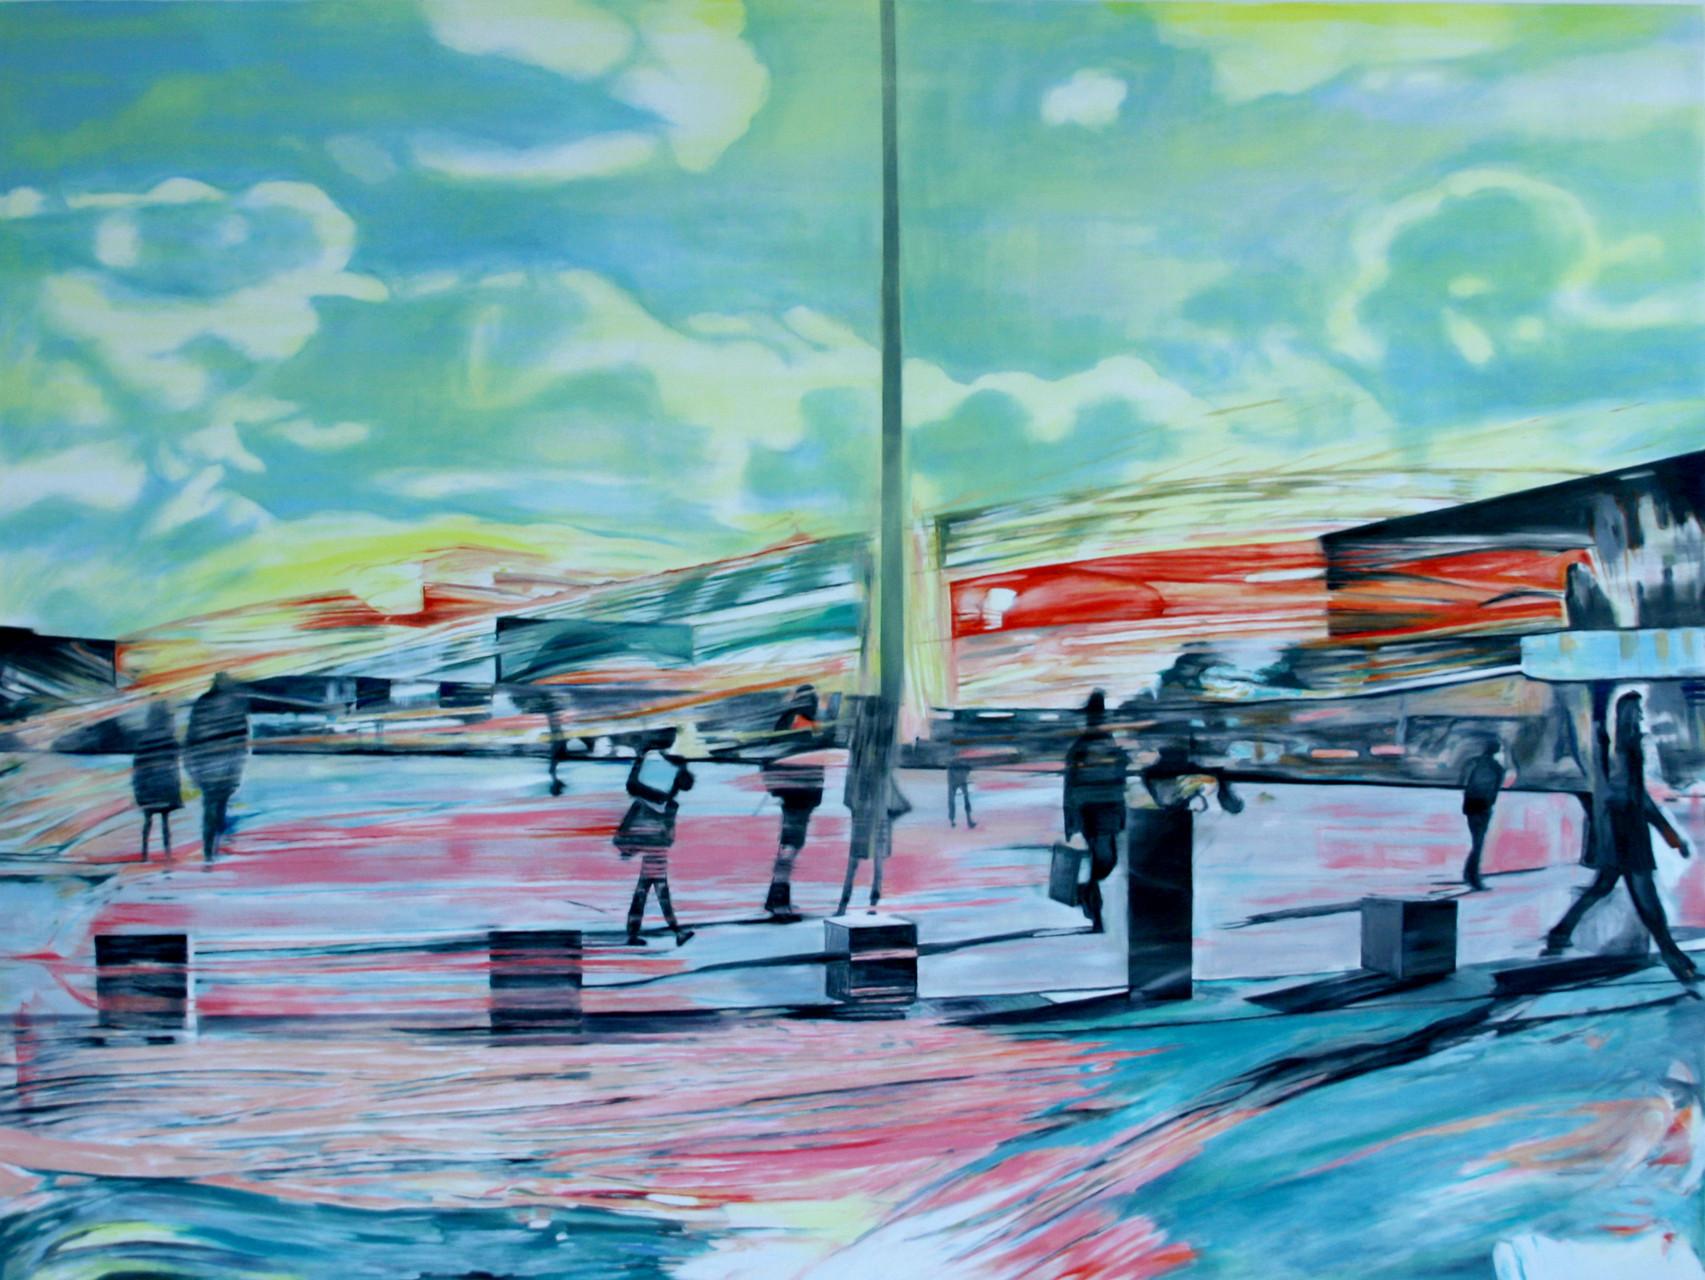 vereinzelt 2015    Öl auf Leinwand   120 x 160 cm